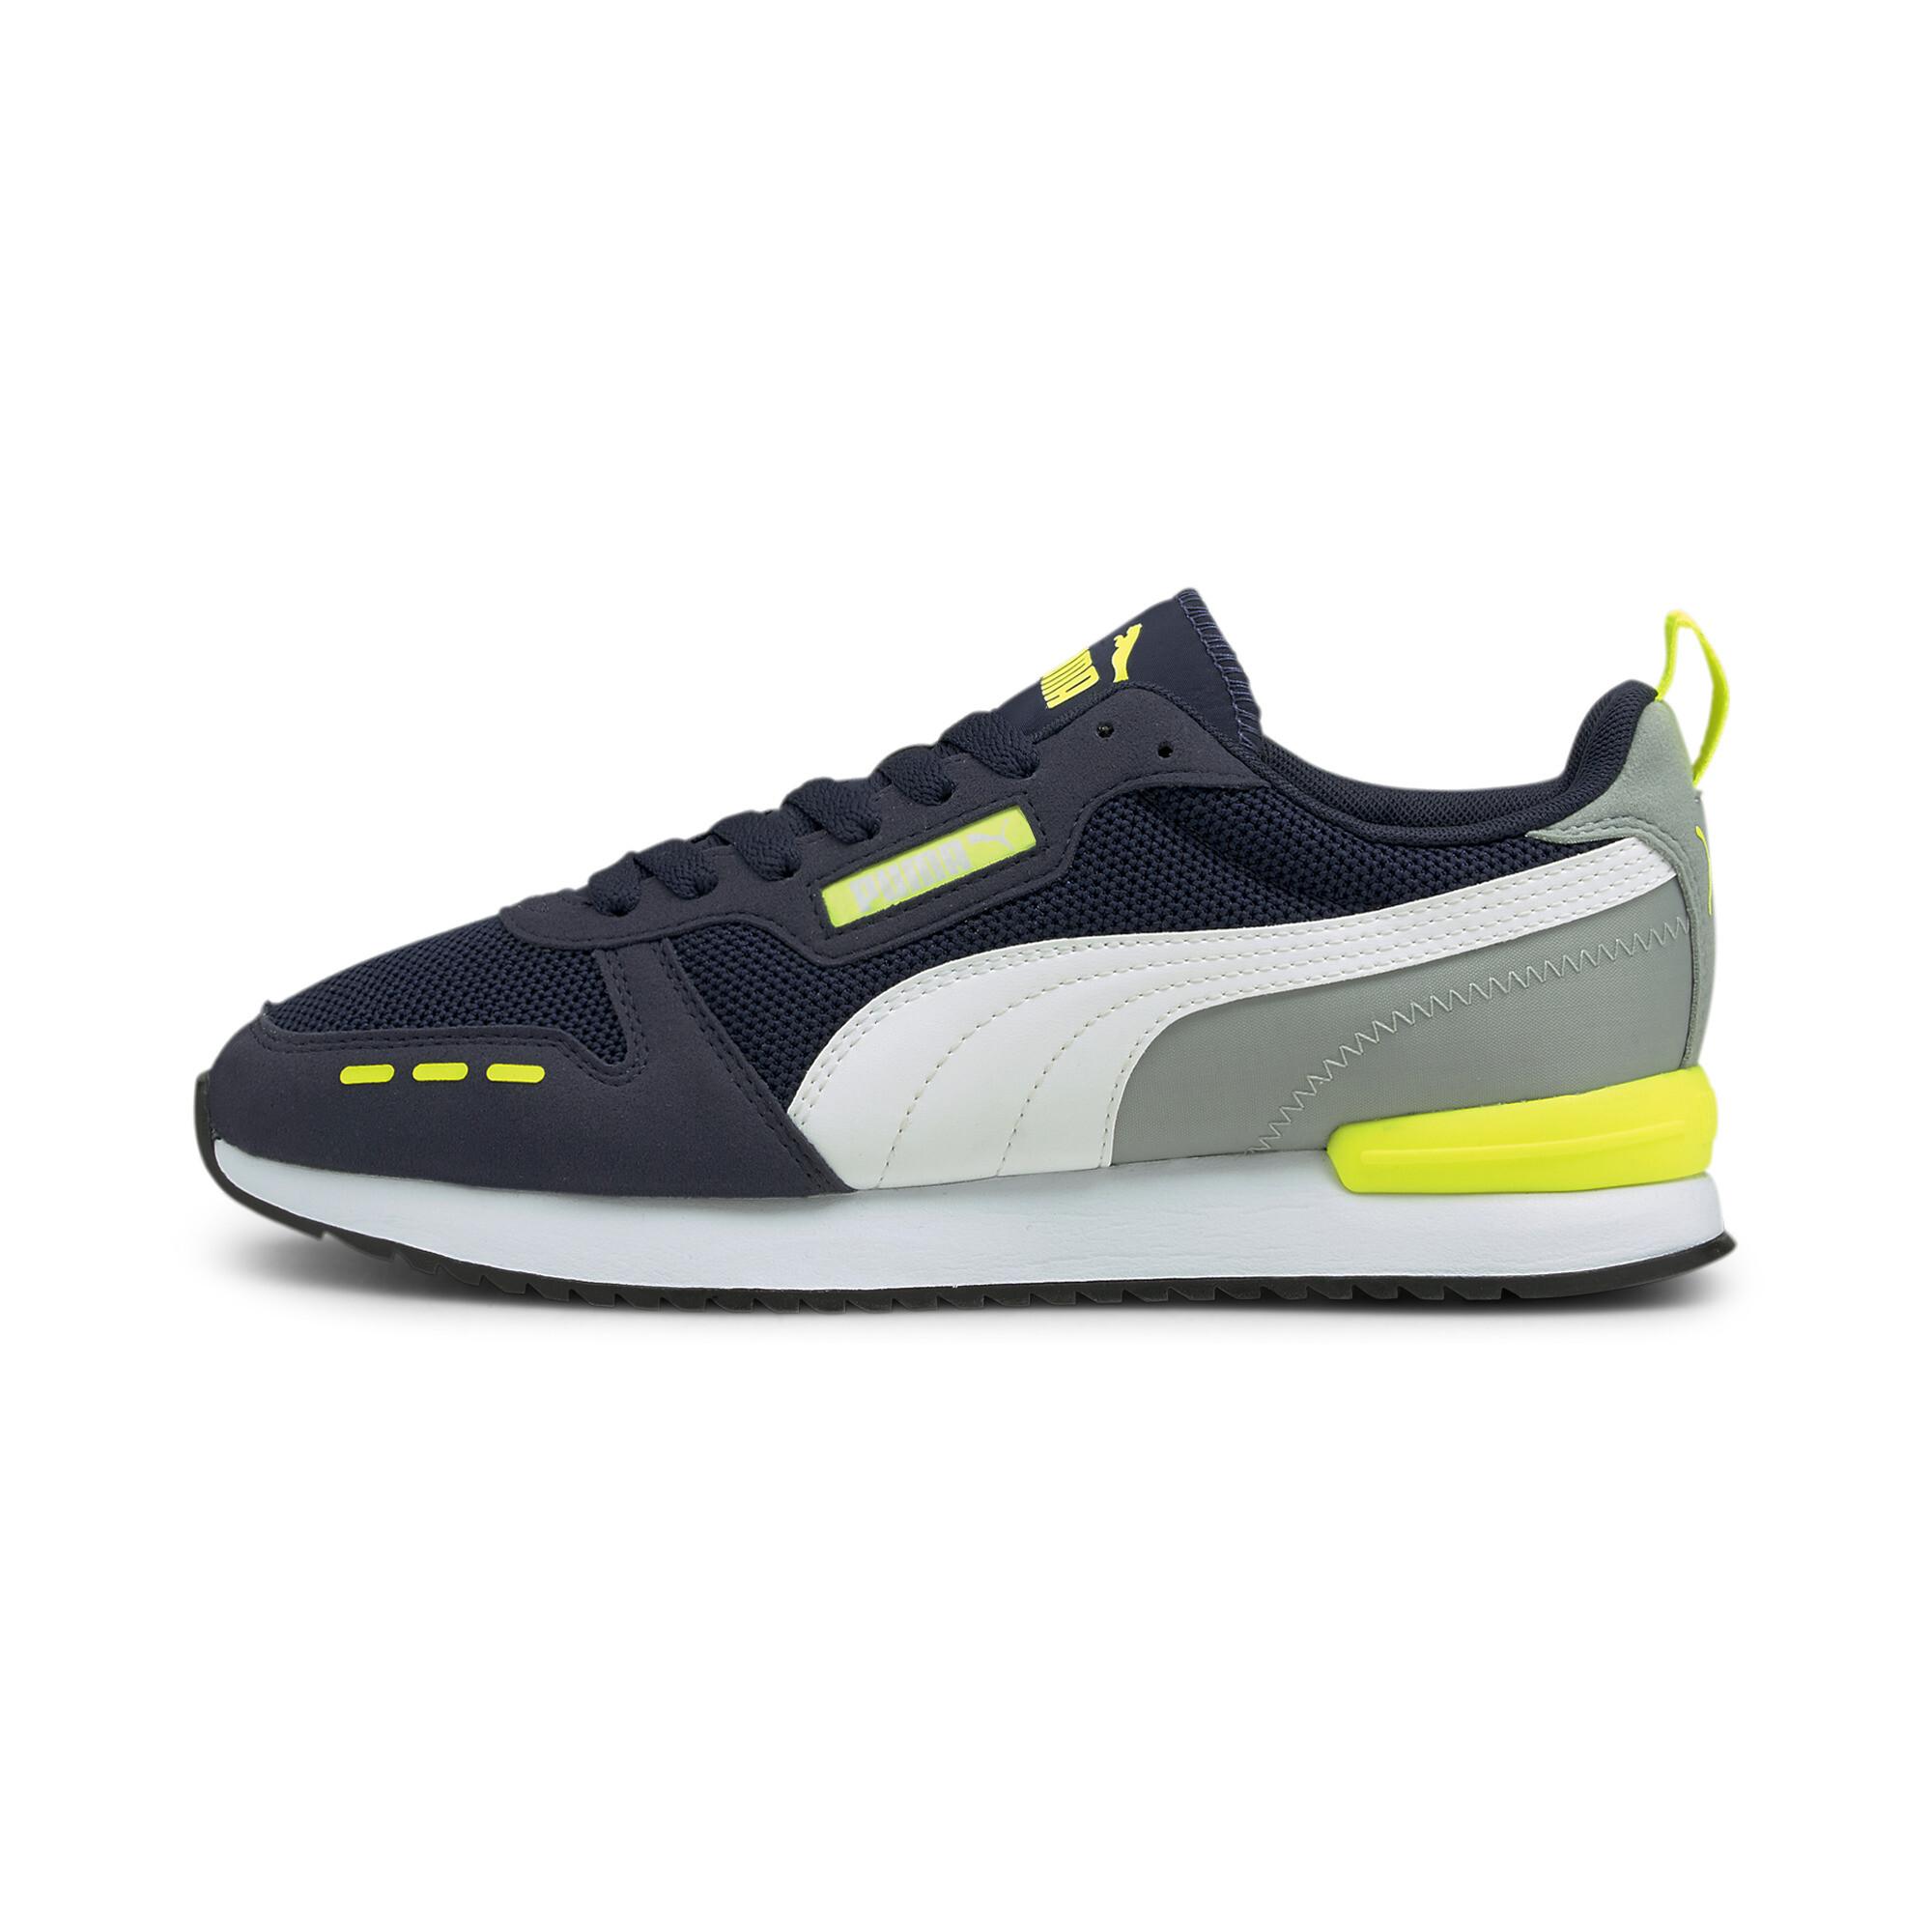 thumbnail 19 - PUMA-Men-039-s-R78-Sneakers